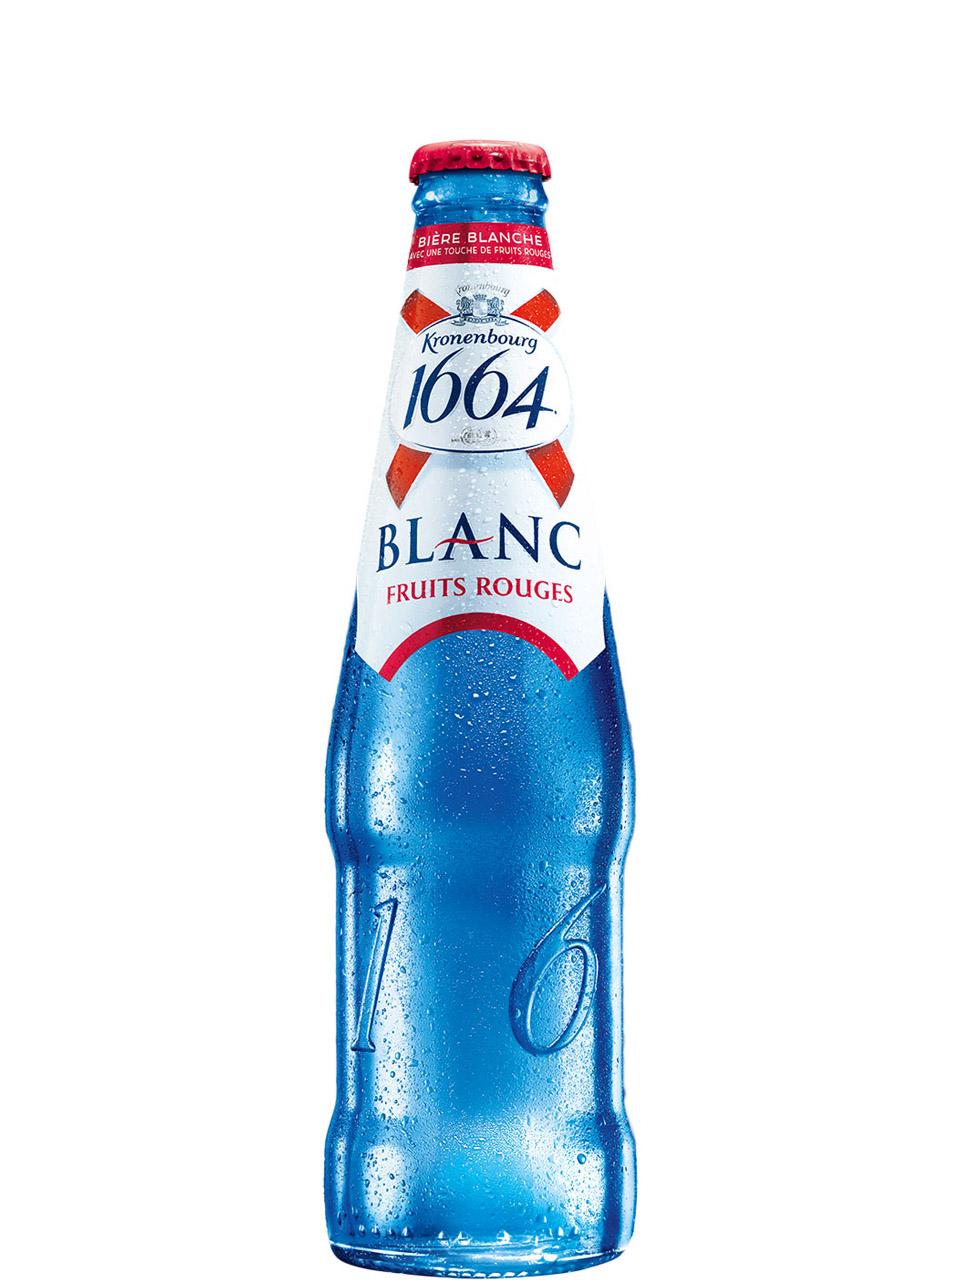 Kronenbourg 1664 Blanc Fruits Rouges 6pk Bottles